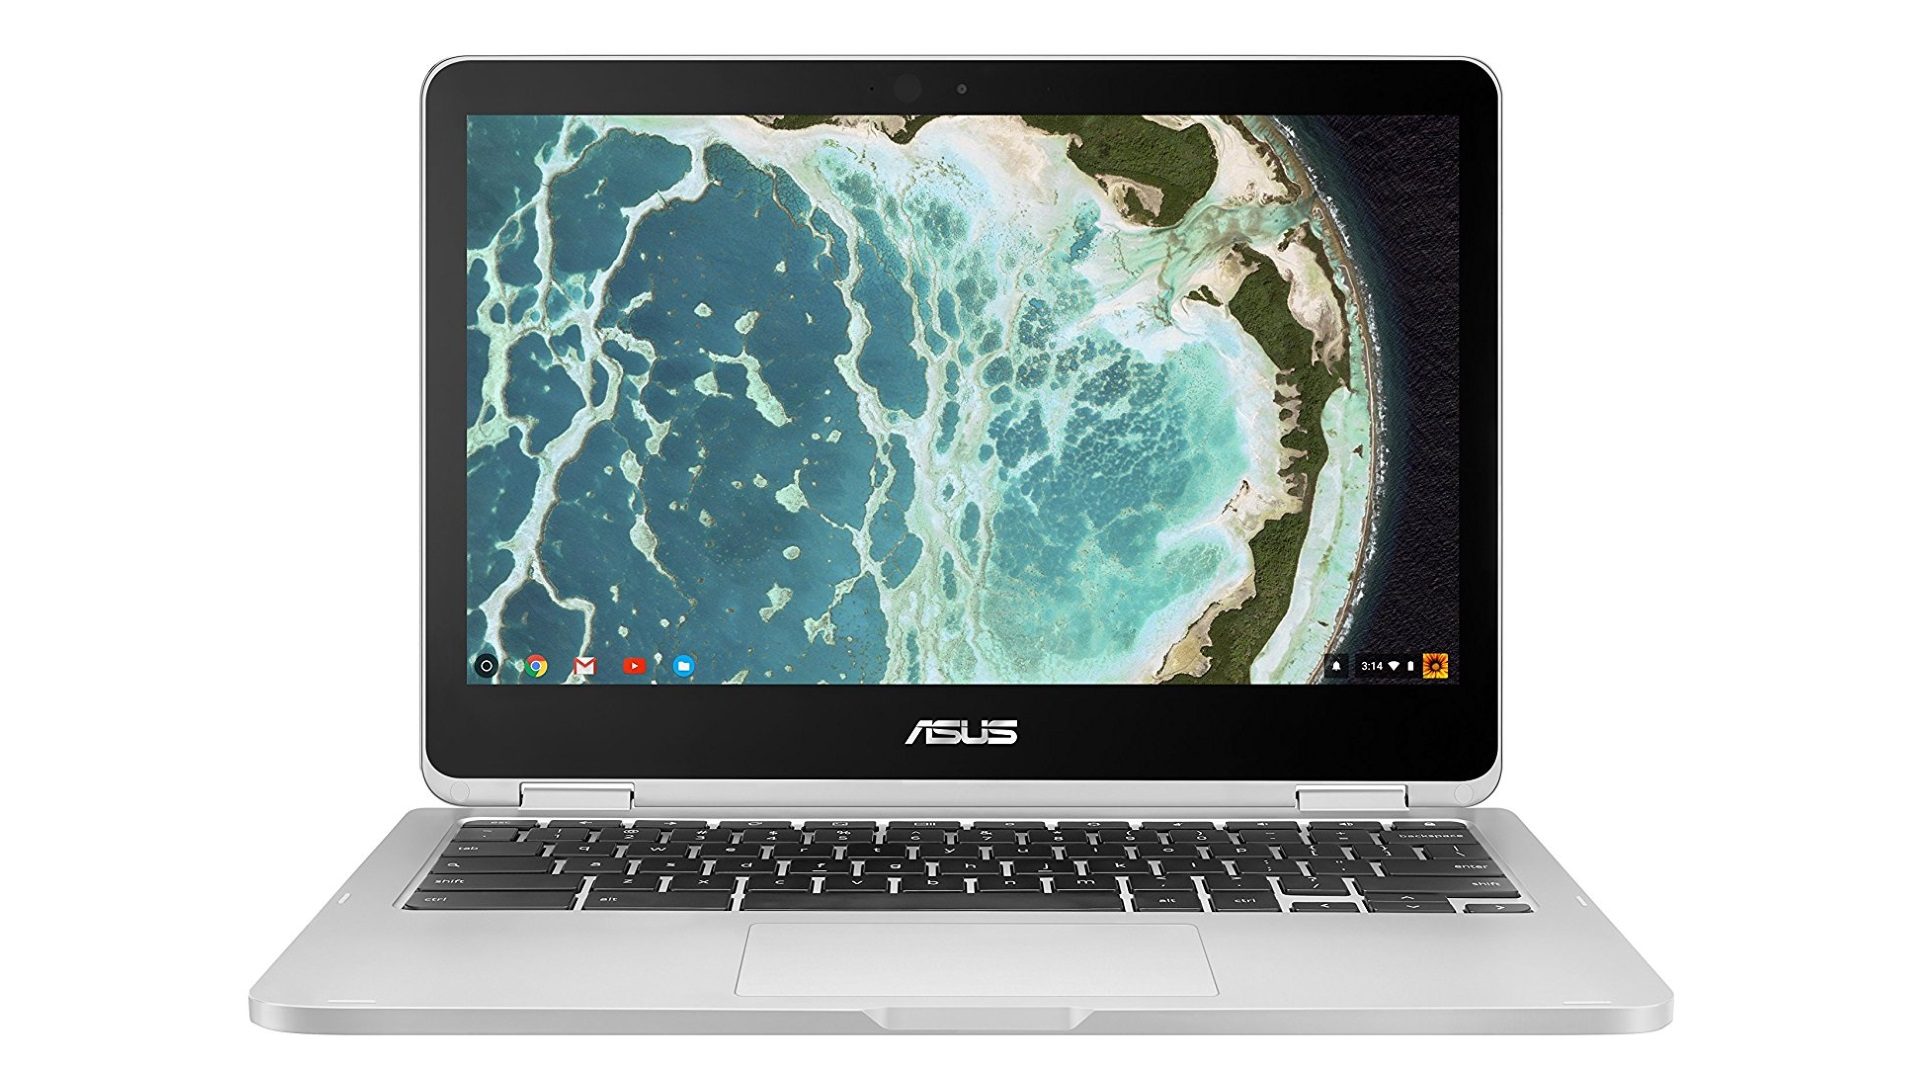 「ASUS Chromebook Flip C213NA/C302CA」は9月8日発売